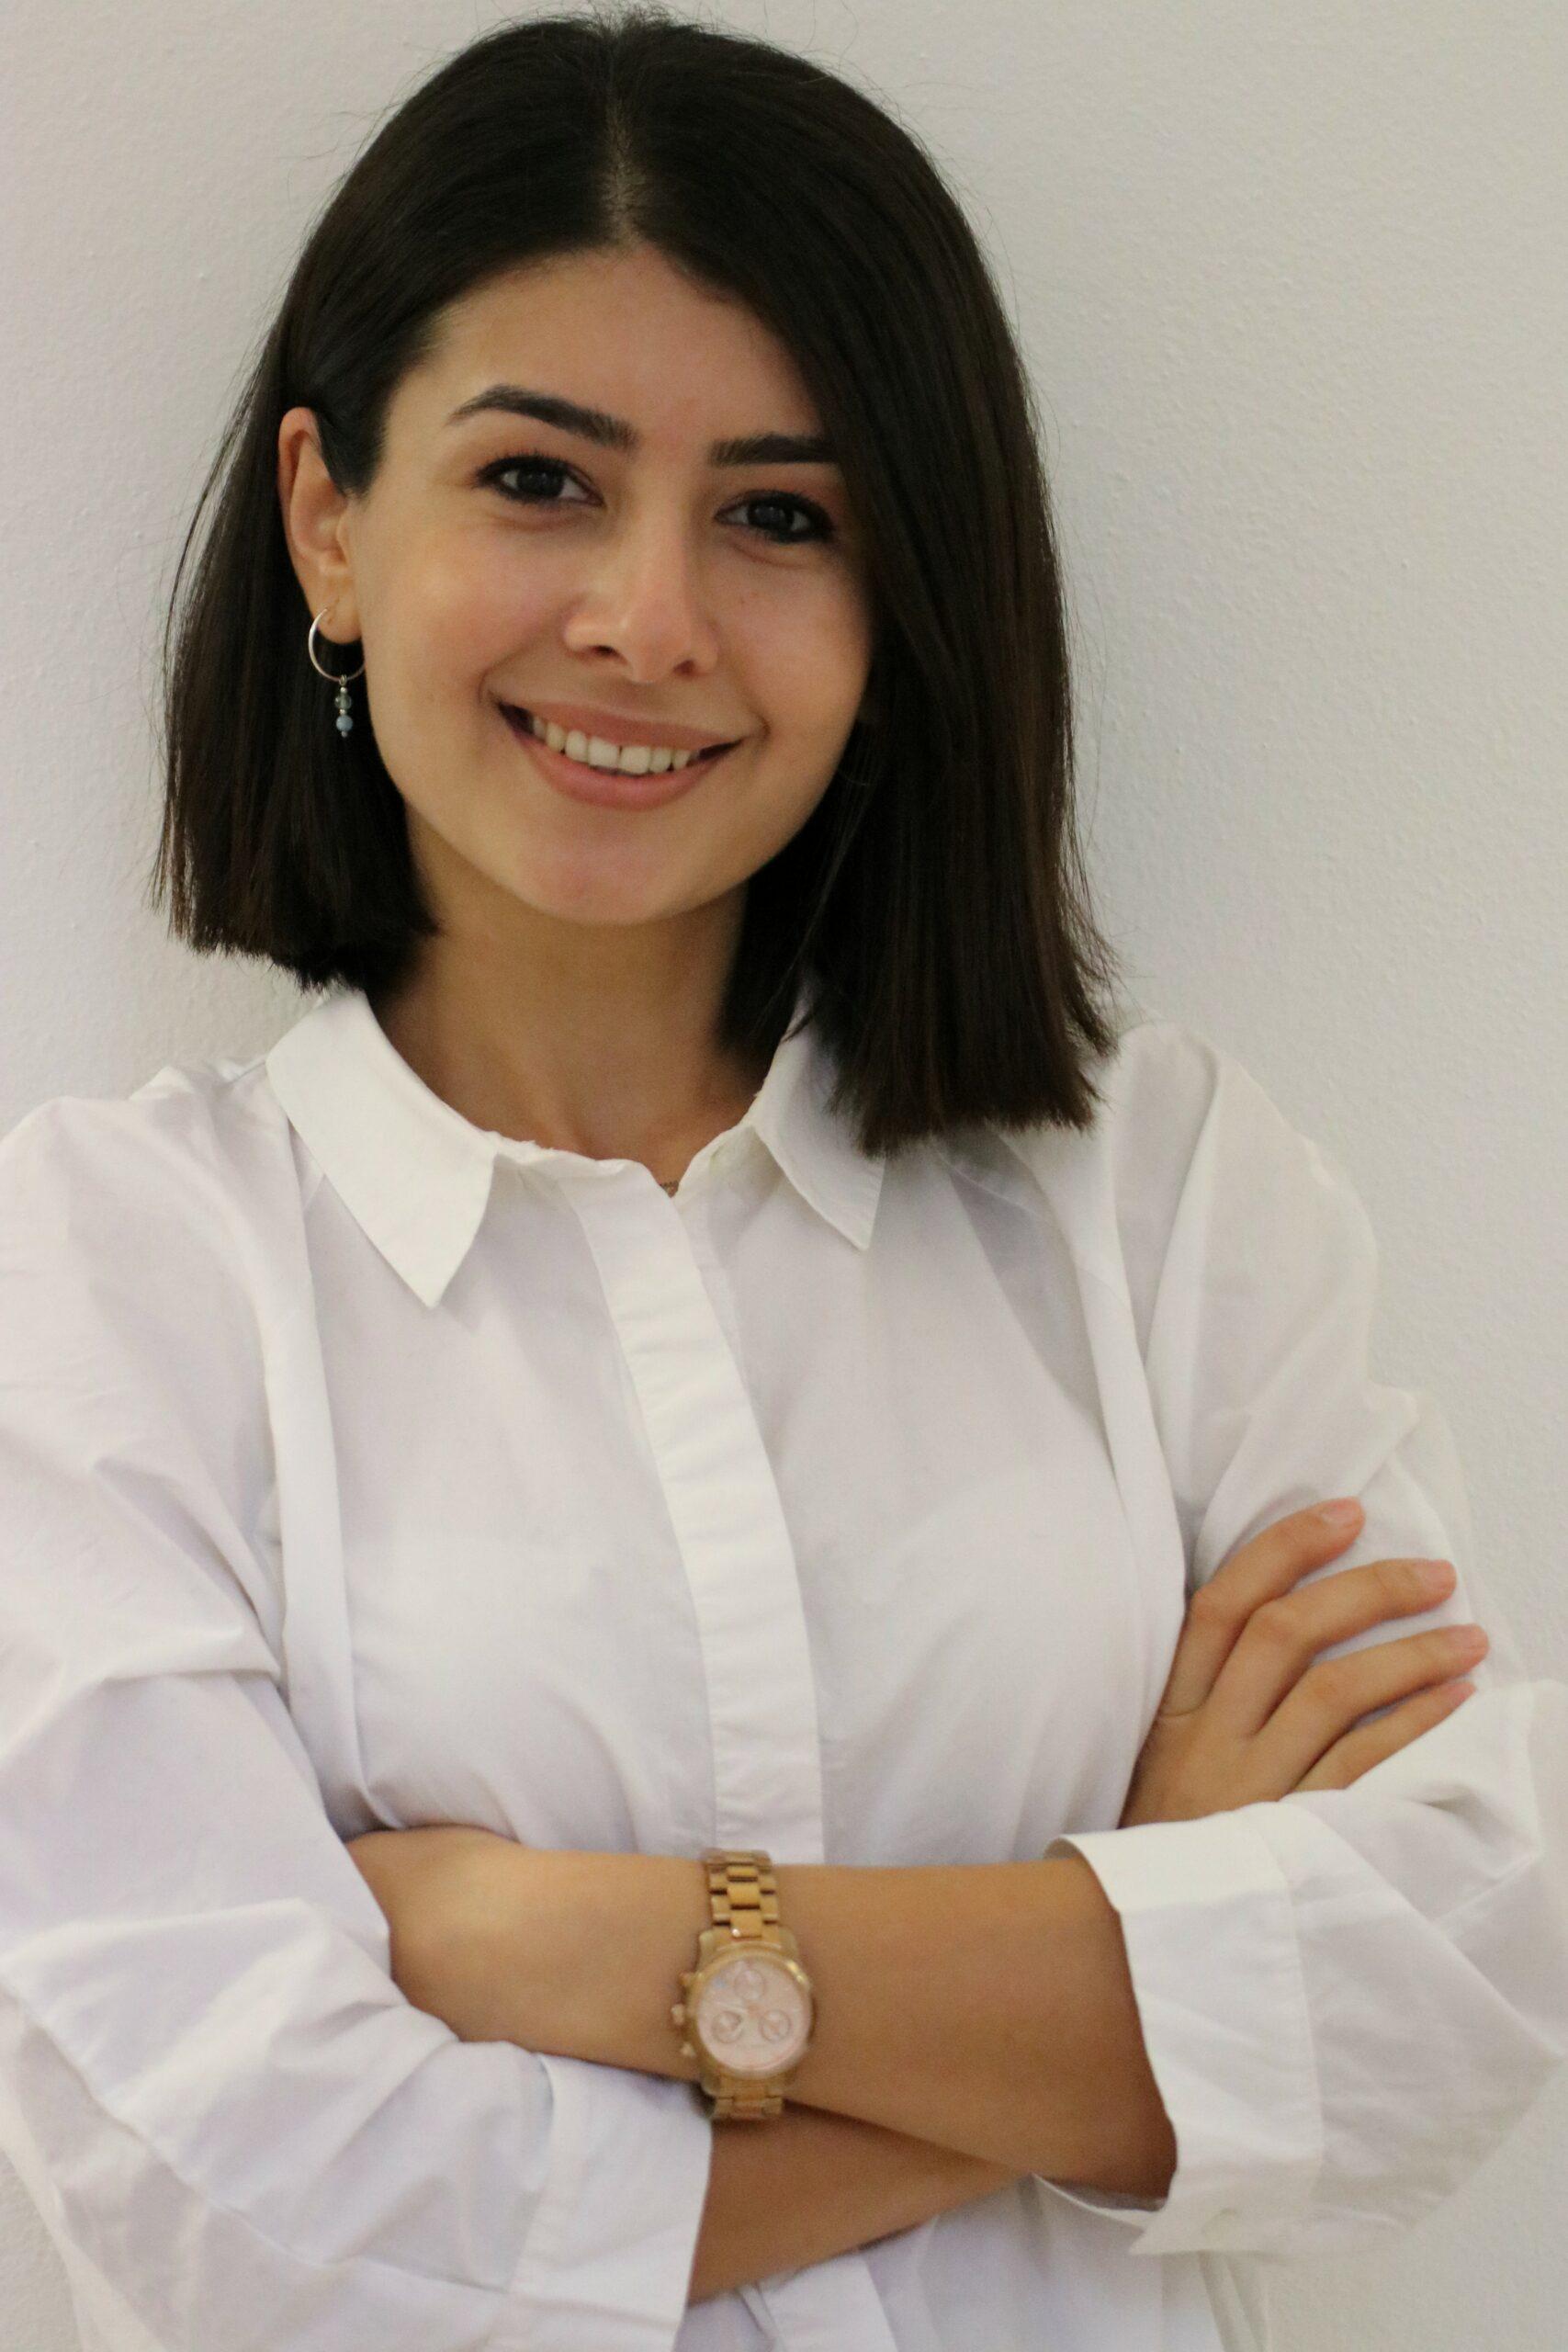 Nikita Genze